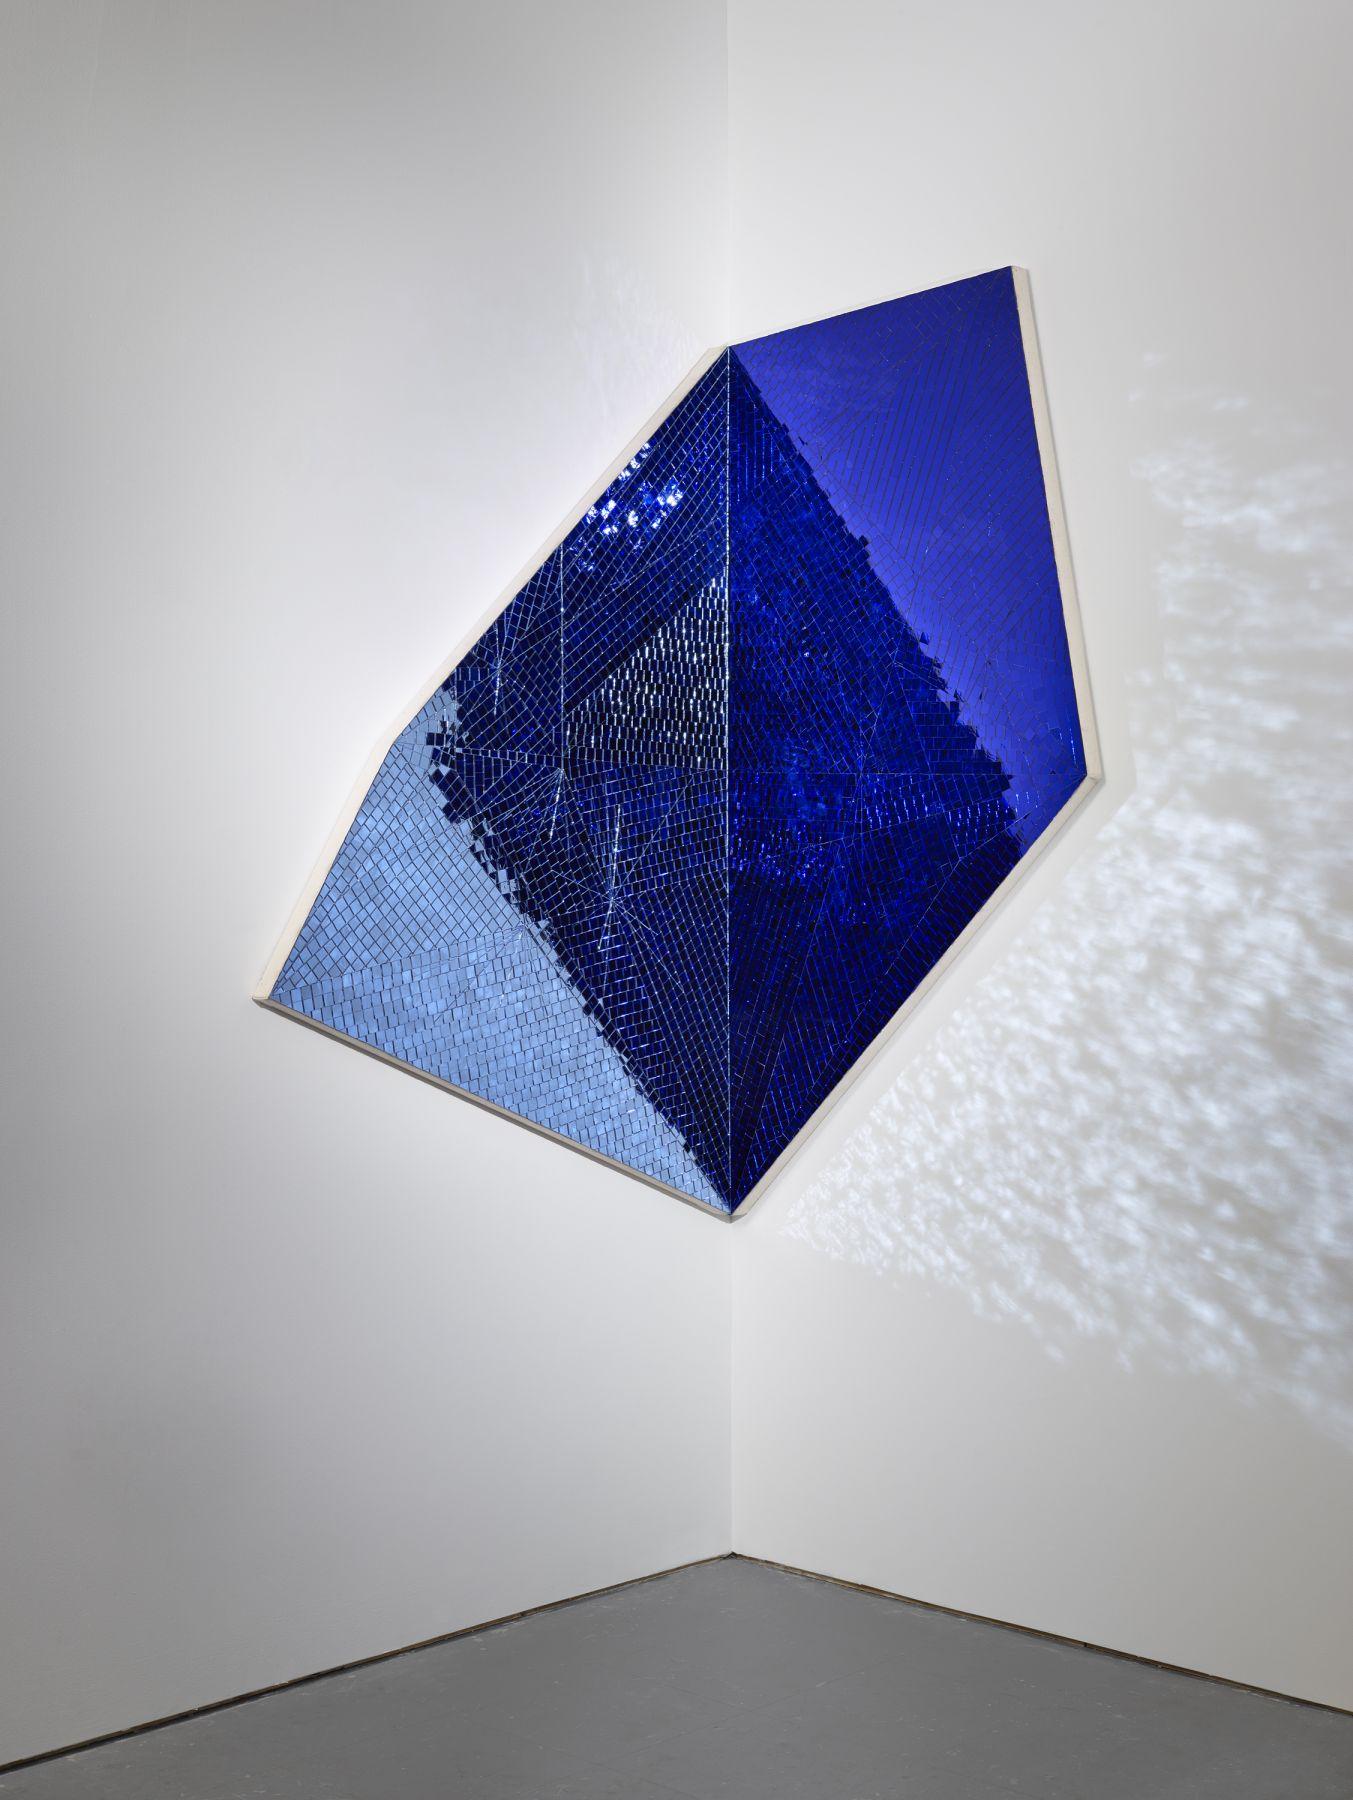 Jim Hodges, Toward Great Becoming (blue/blue), 2014